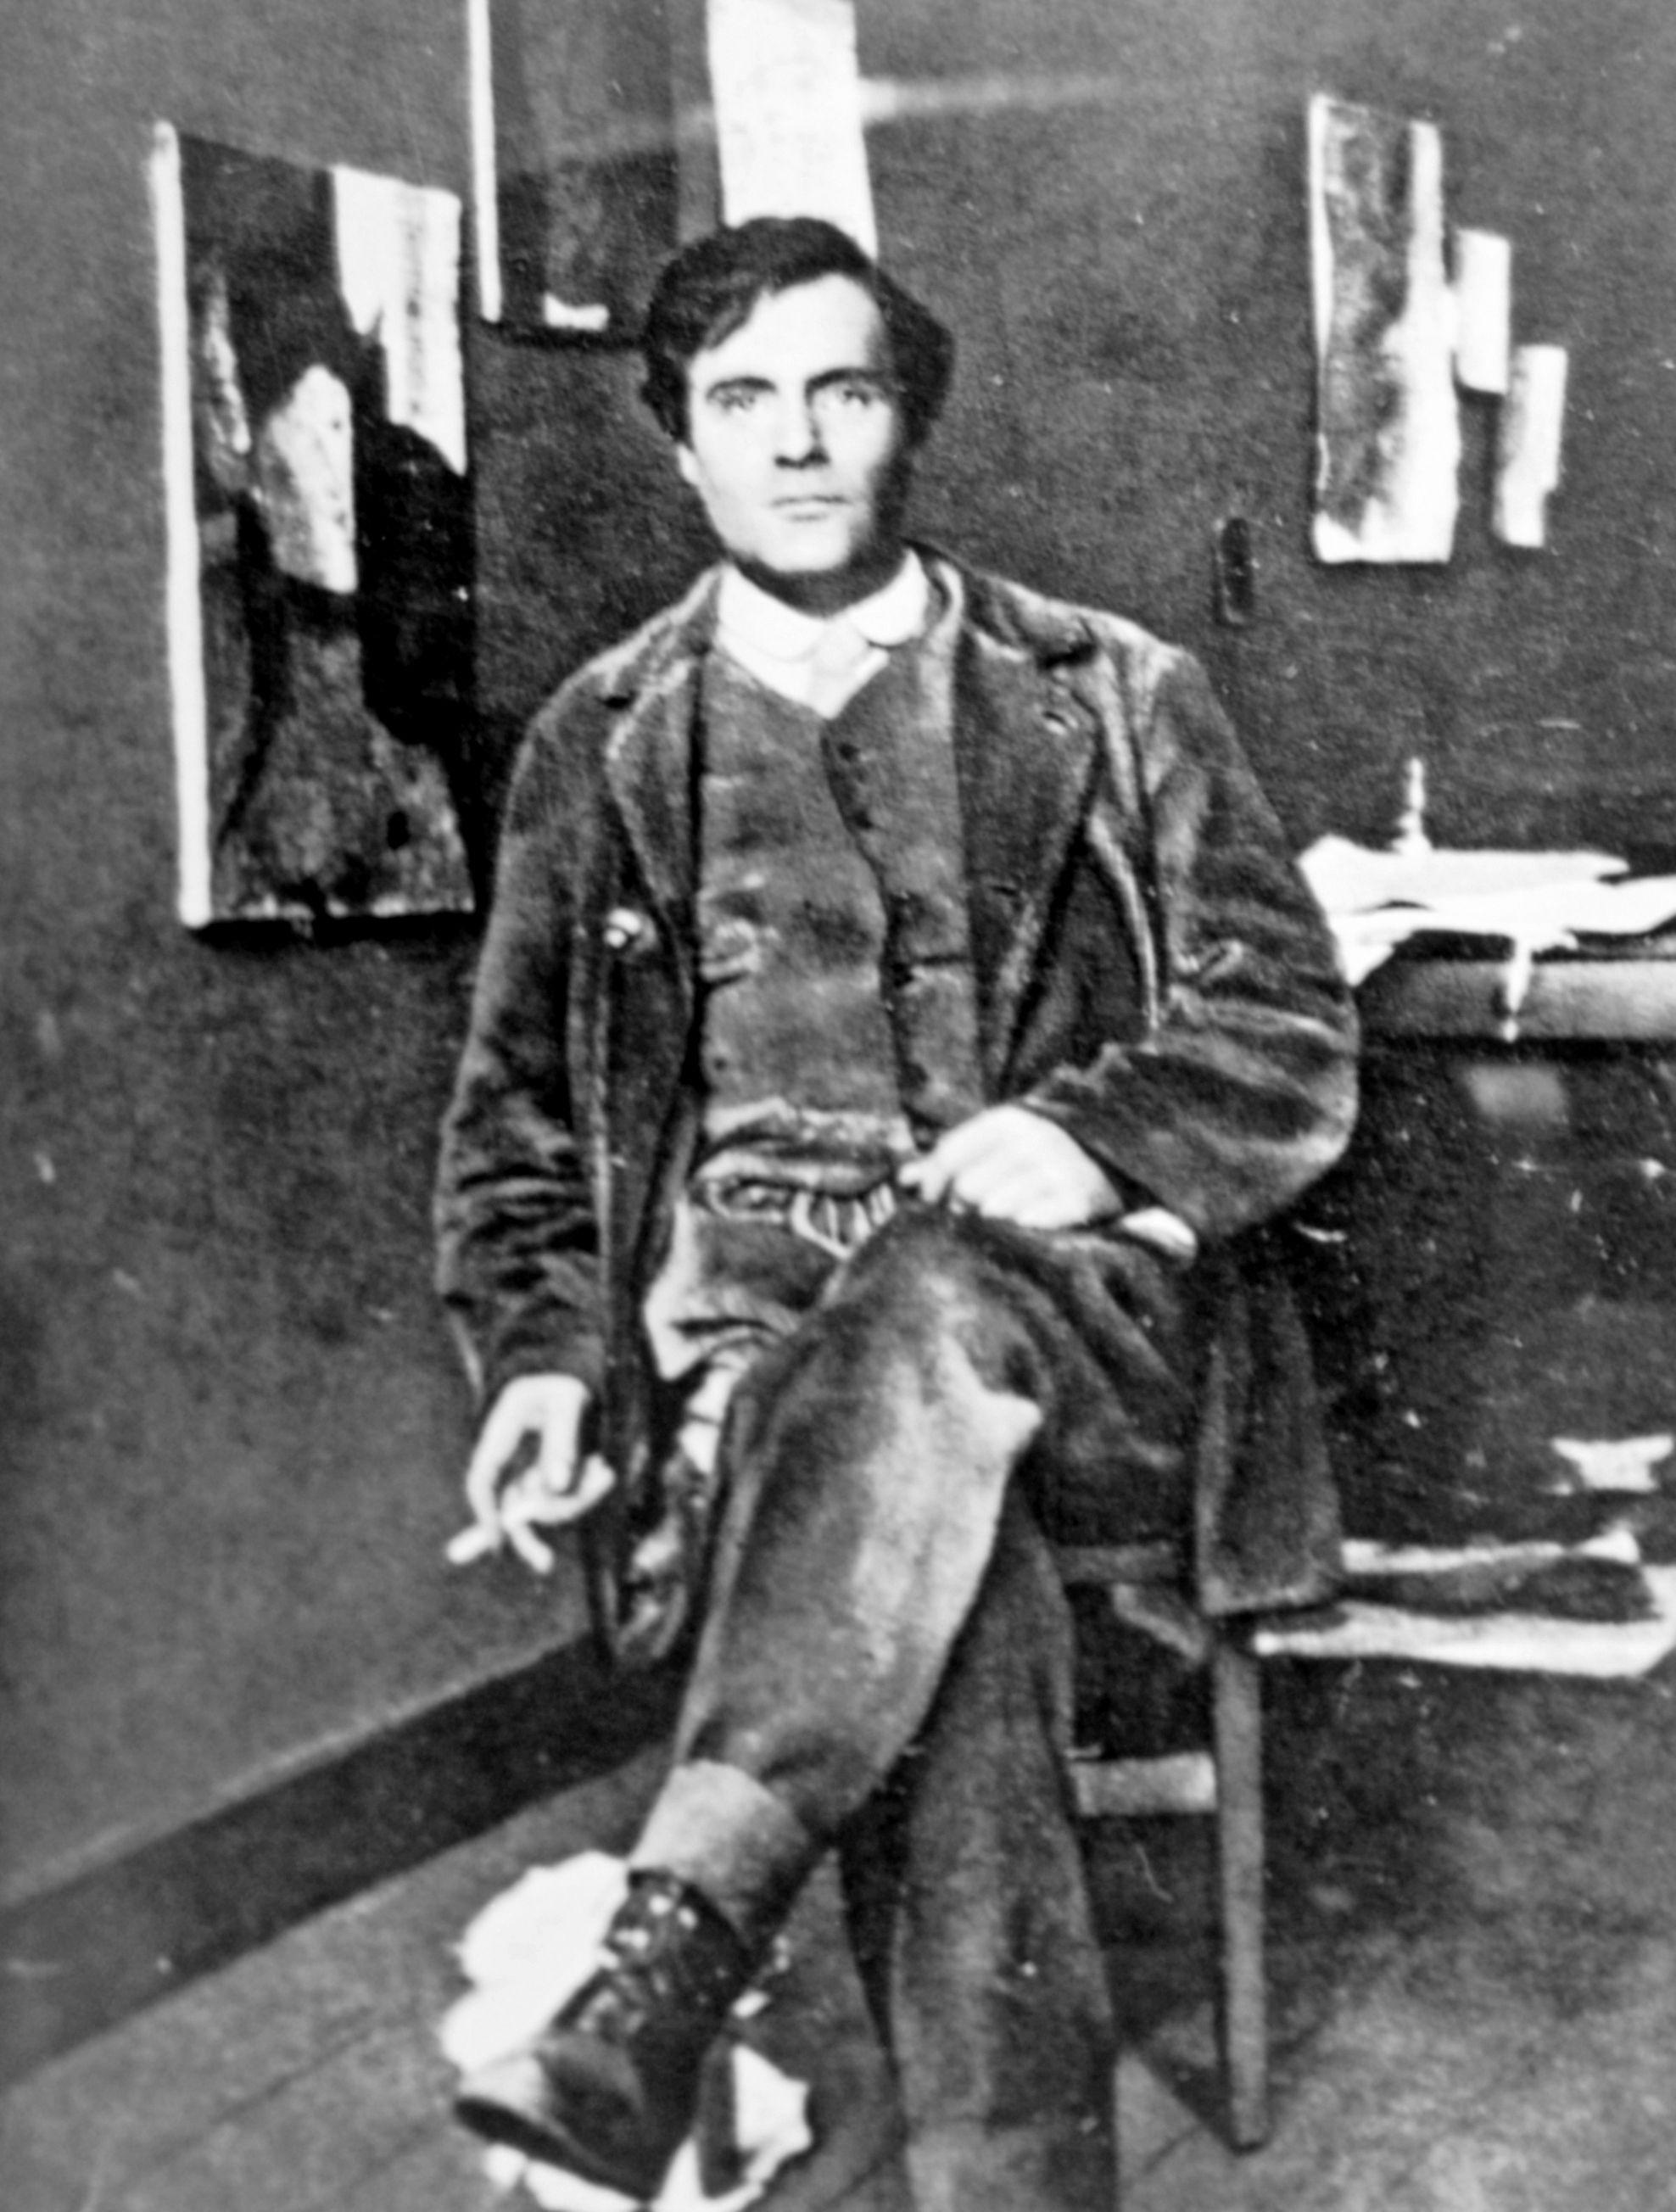 amedeo modigliani en su estudio en 1915 art pinterest amedeo modigliani artist and paintings. Black Bedroom Furniture Sets. Home Design Ideas